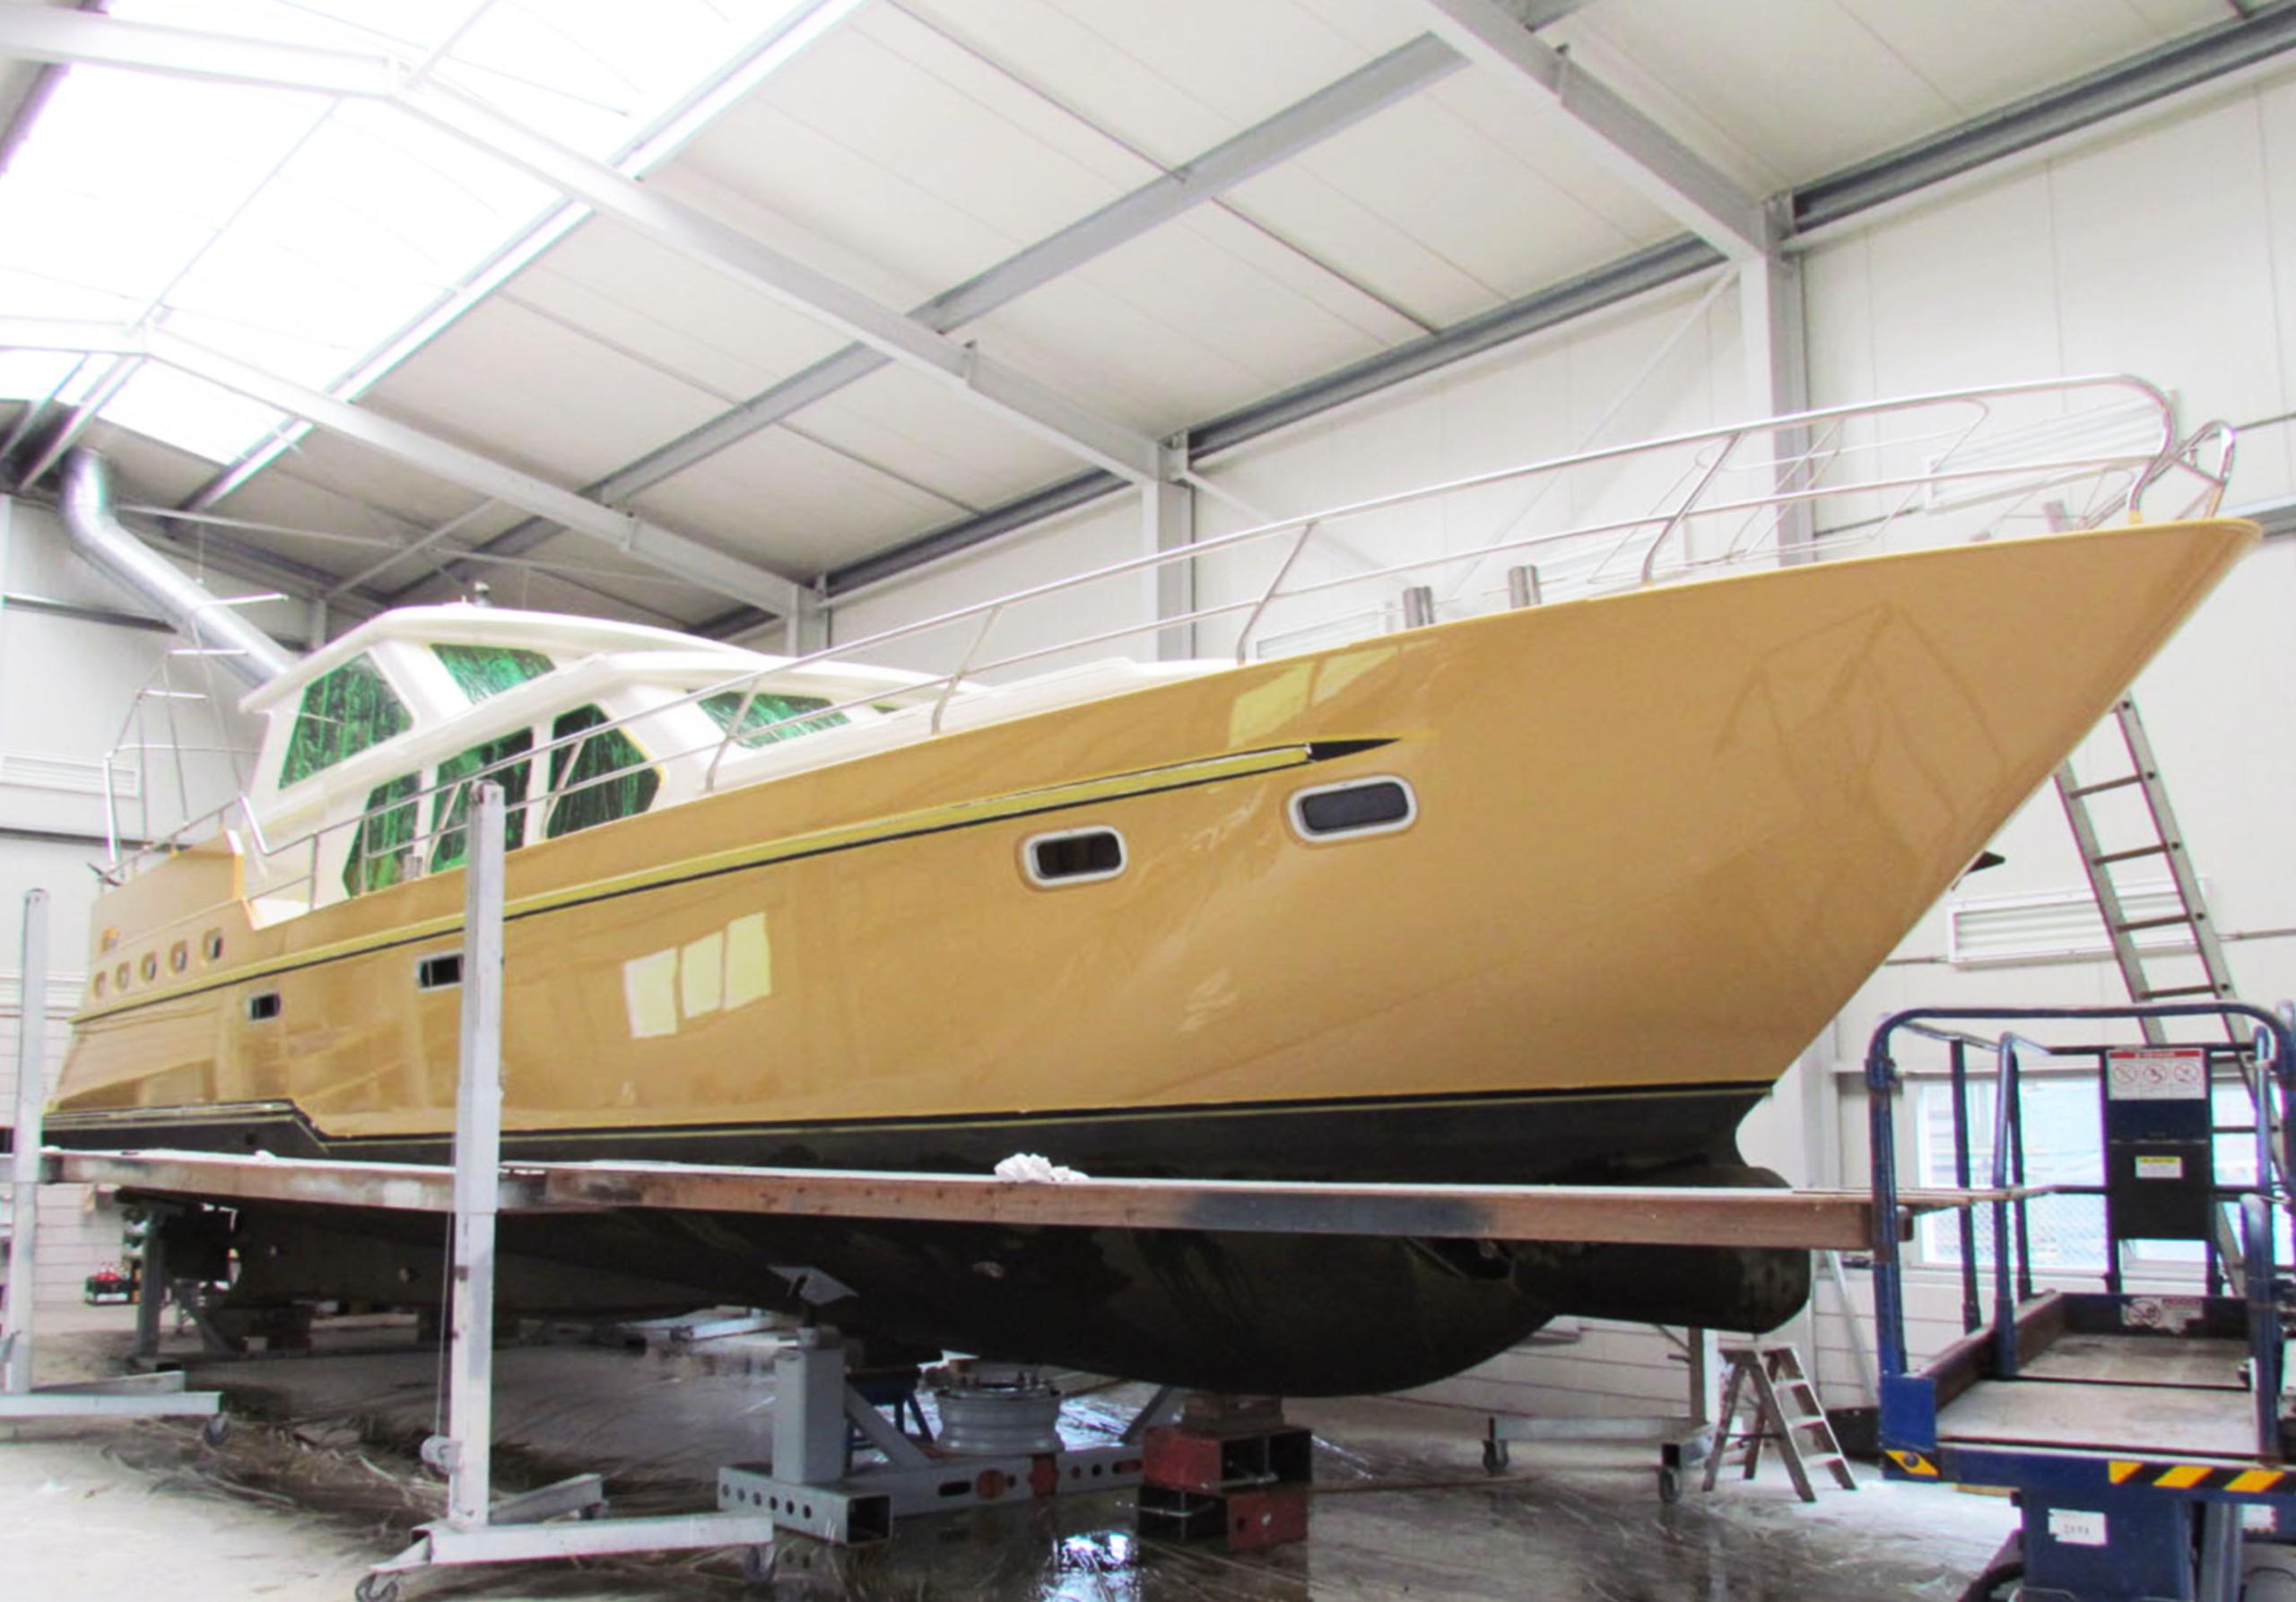 Jachtschilder Friesland-jacht-houten-boot-sloep-bootlak-jachtlak-classic-design-yacht-painters